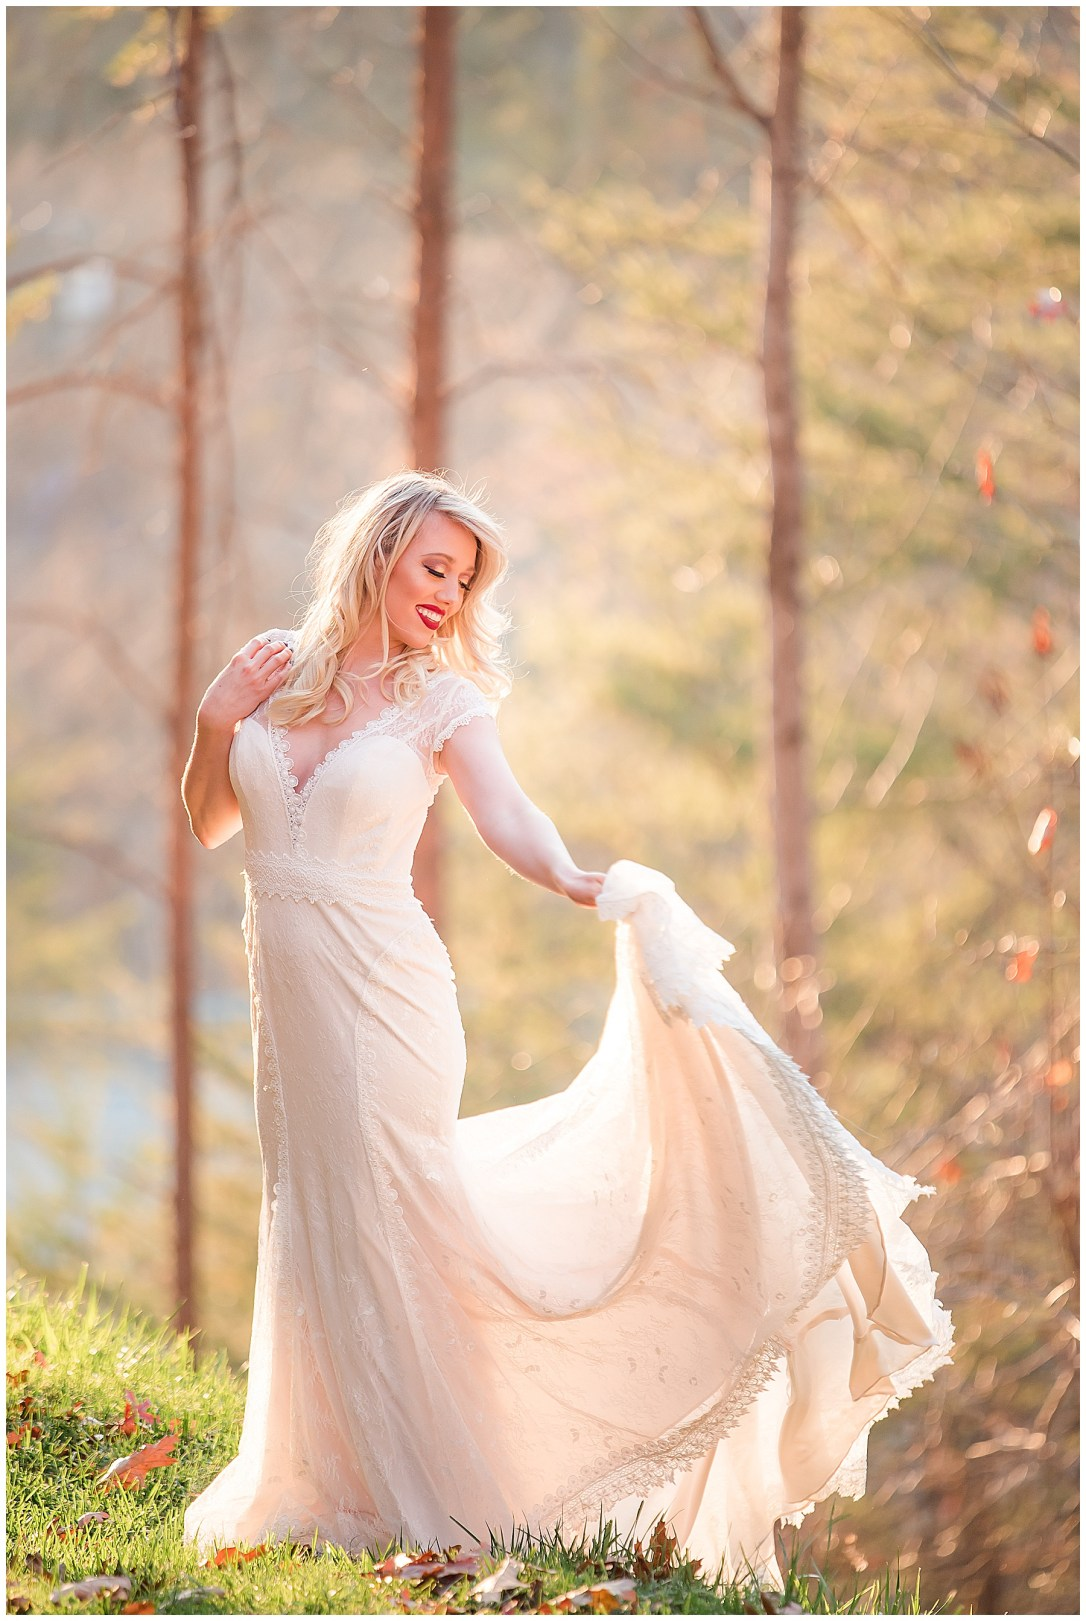 Forrest bridal portraits